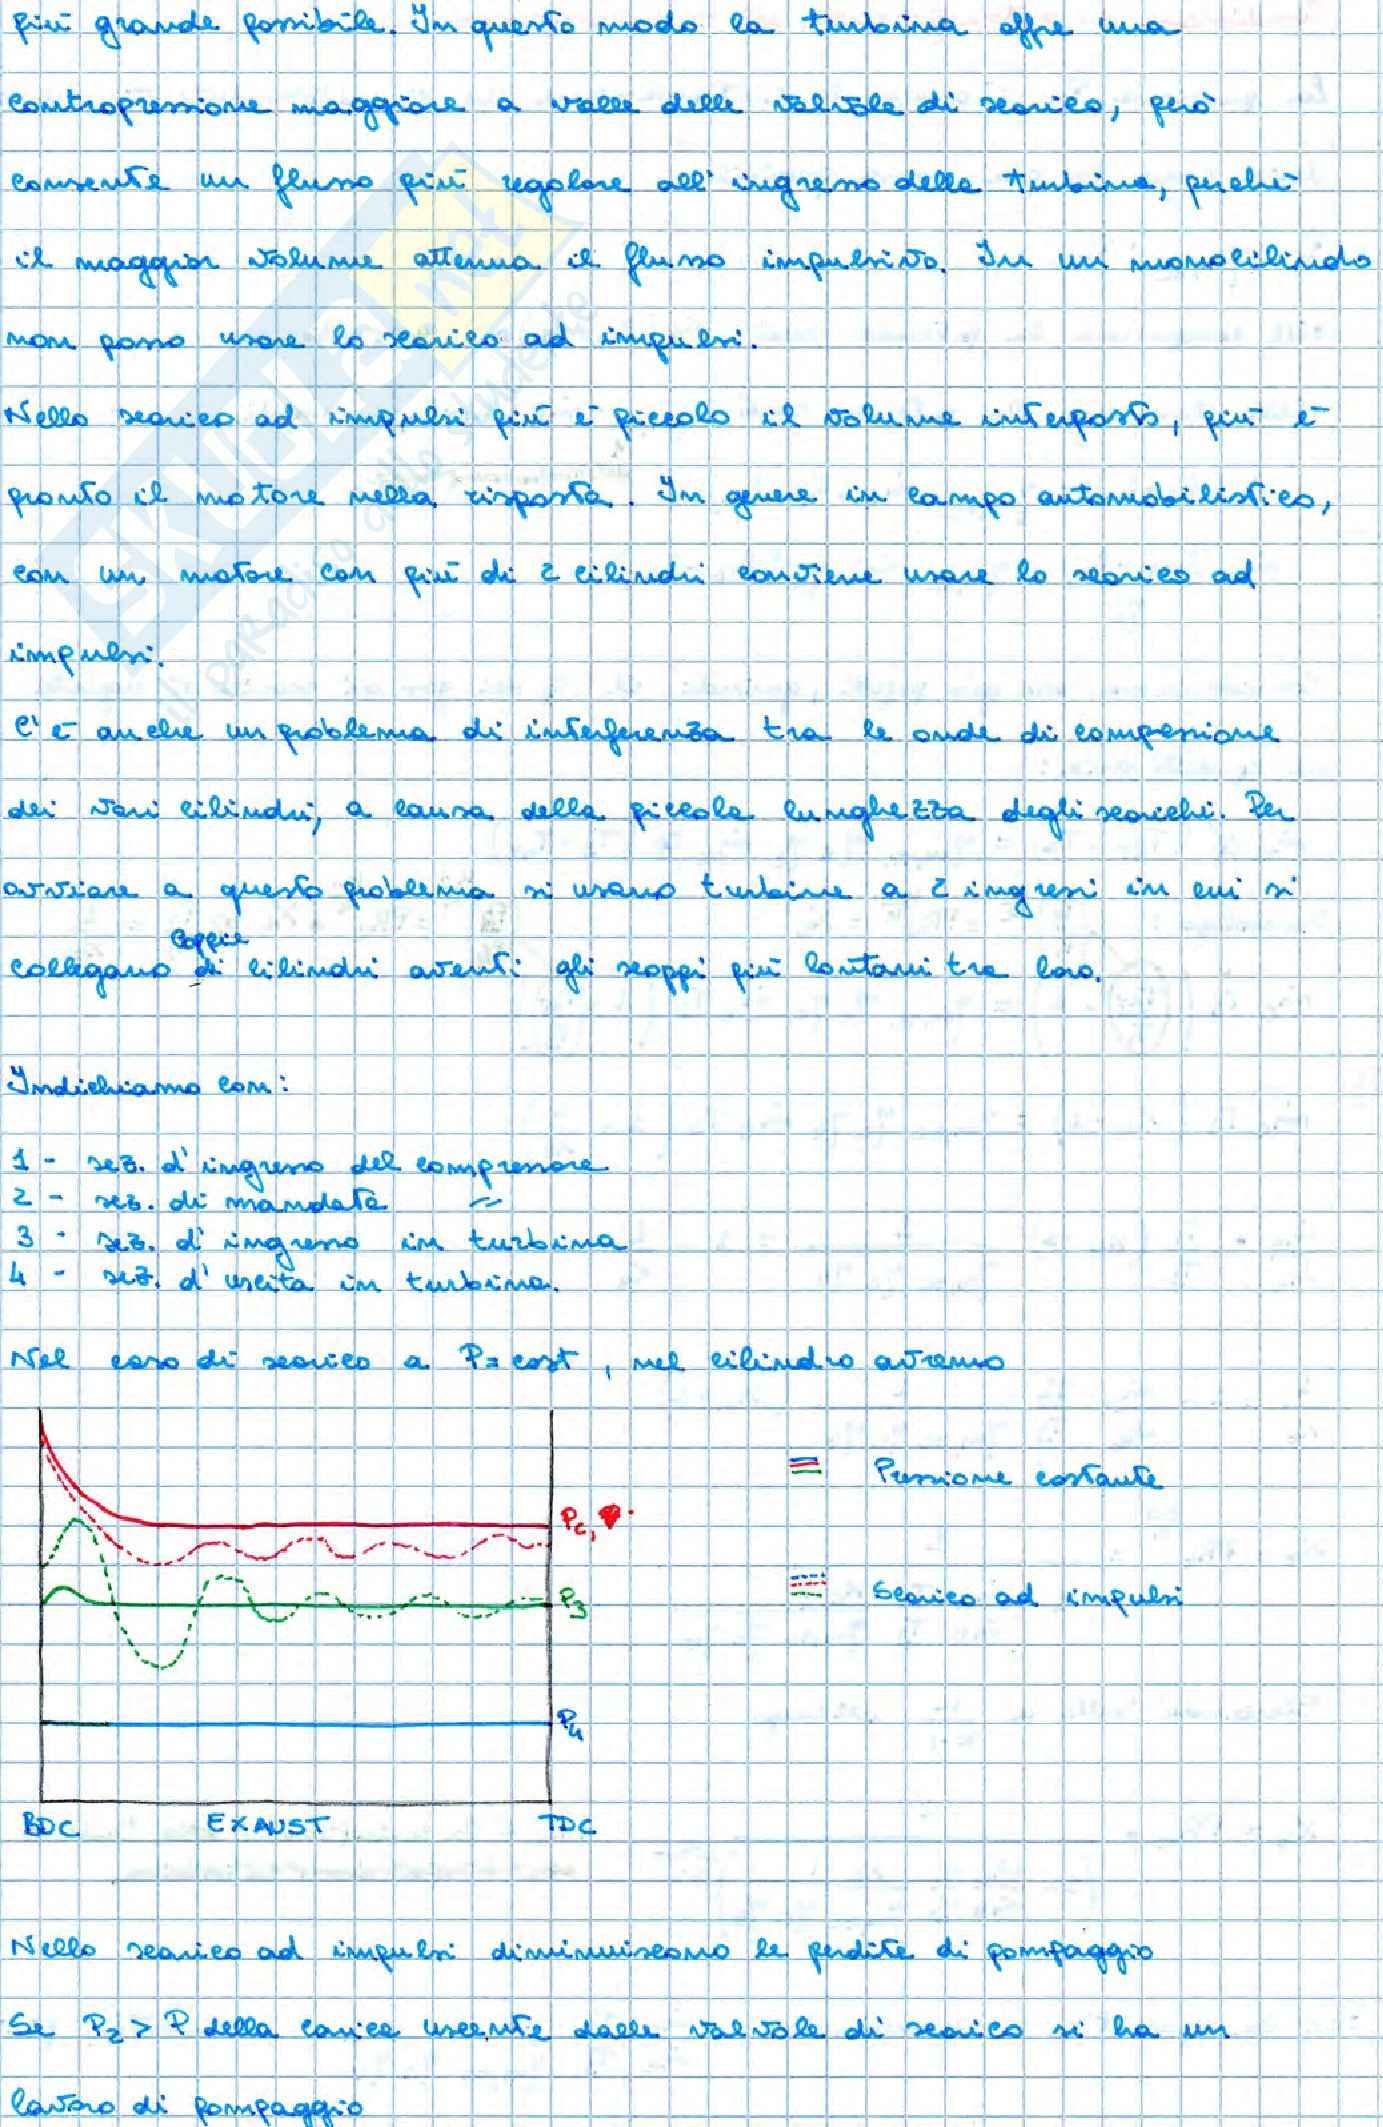 Motori a Combustione Interna - Appunti parte 6 Pag. 11